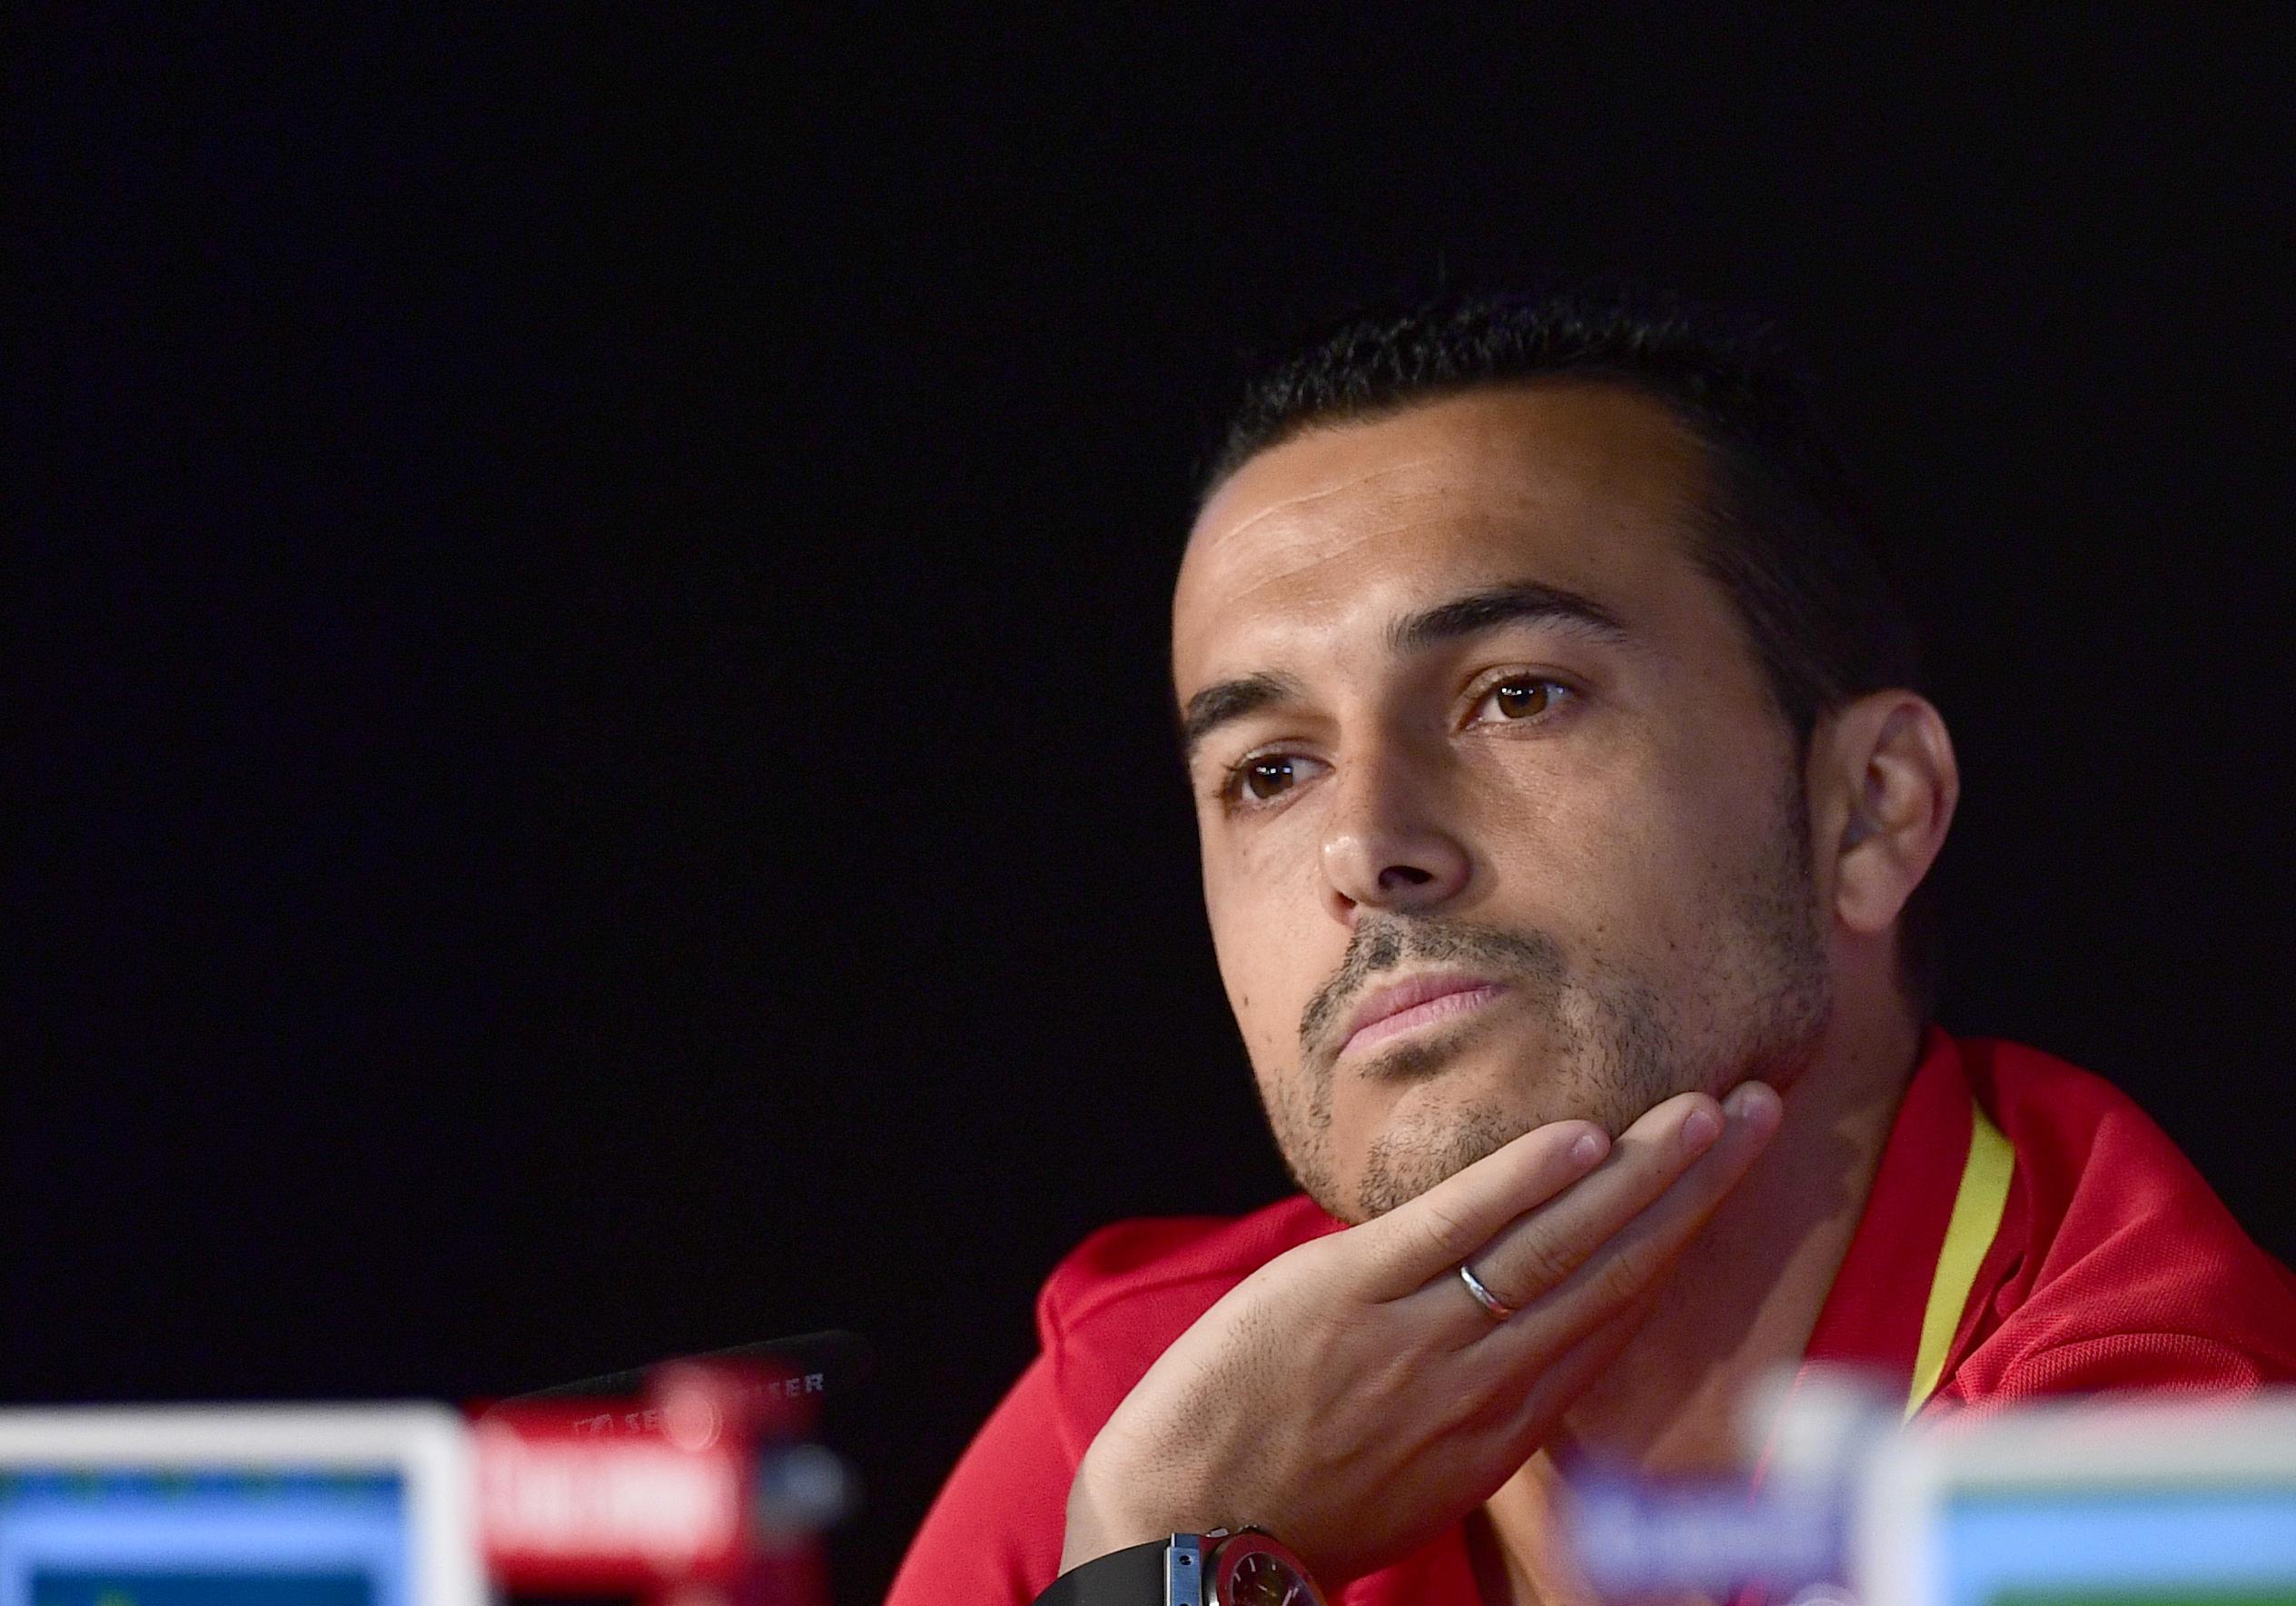 Astonishing Pedro meltdown threatens to disrupt Spain's Euro 2016 campaign